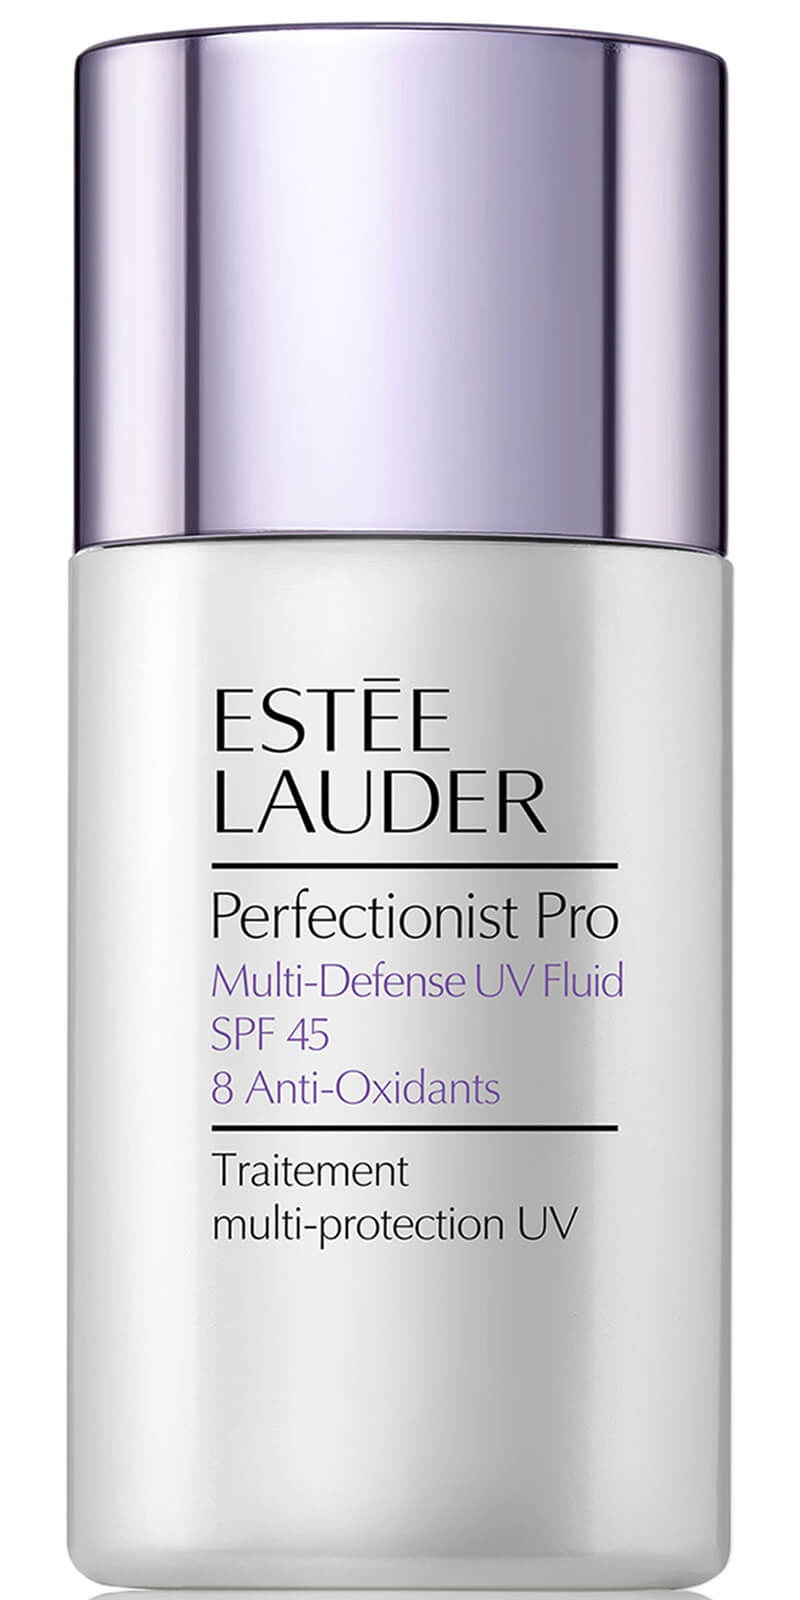 Estée Lauder Perfectionist Pro Multi-Defense Uv Fluid Spf 45 With 8 Anti-Oxidants